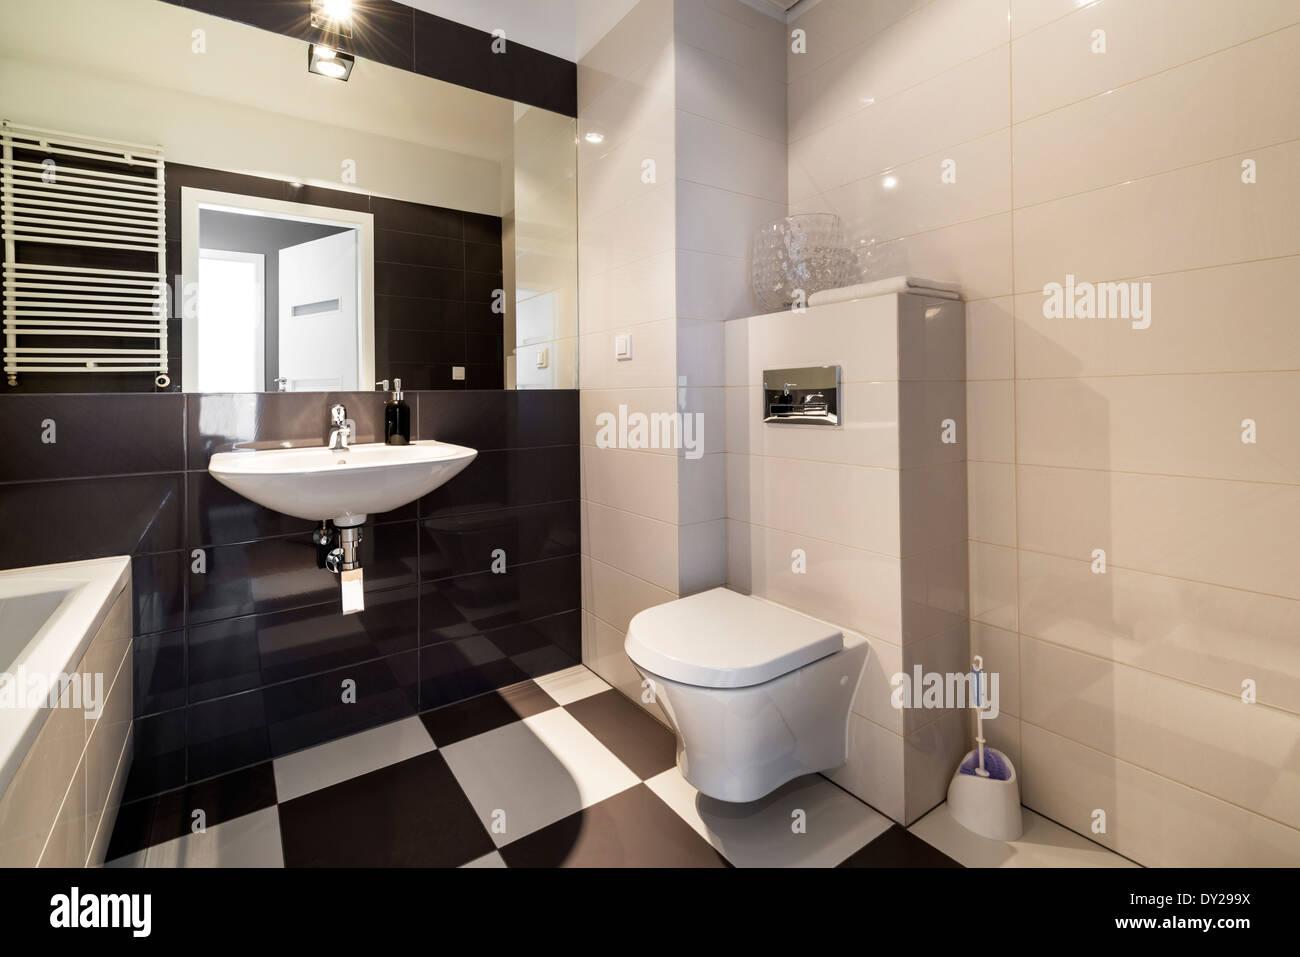 Charmant Modernes Bad Mit Badewanne In Beige Farbe